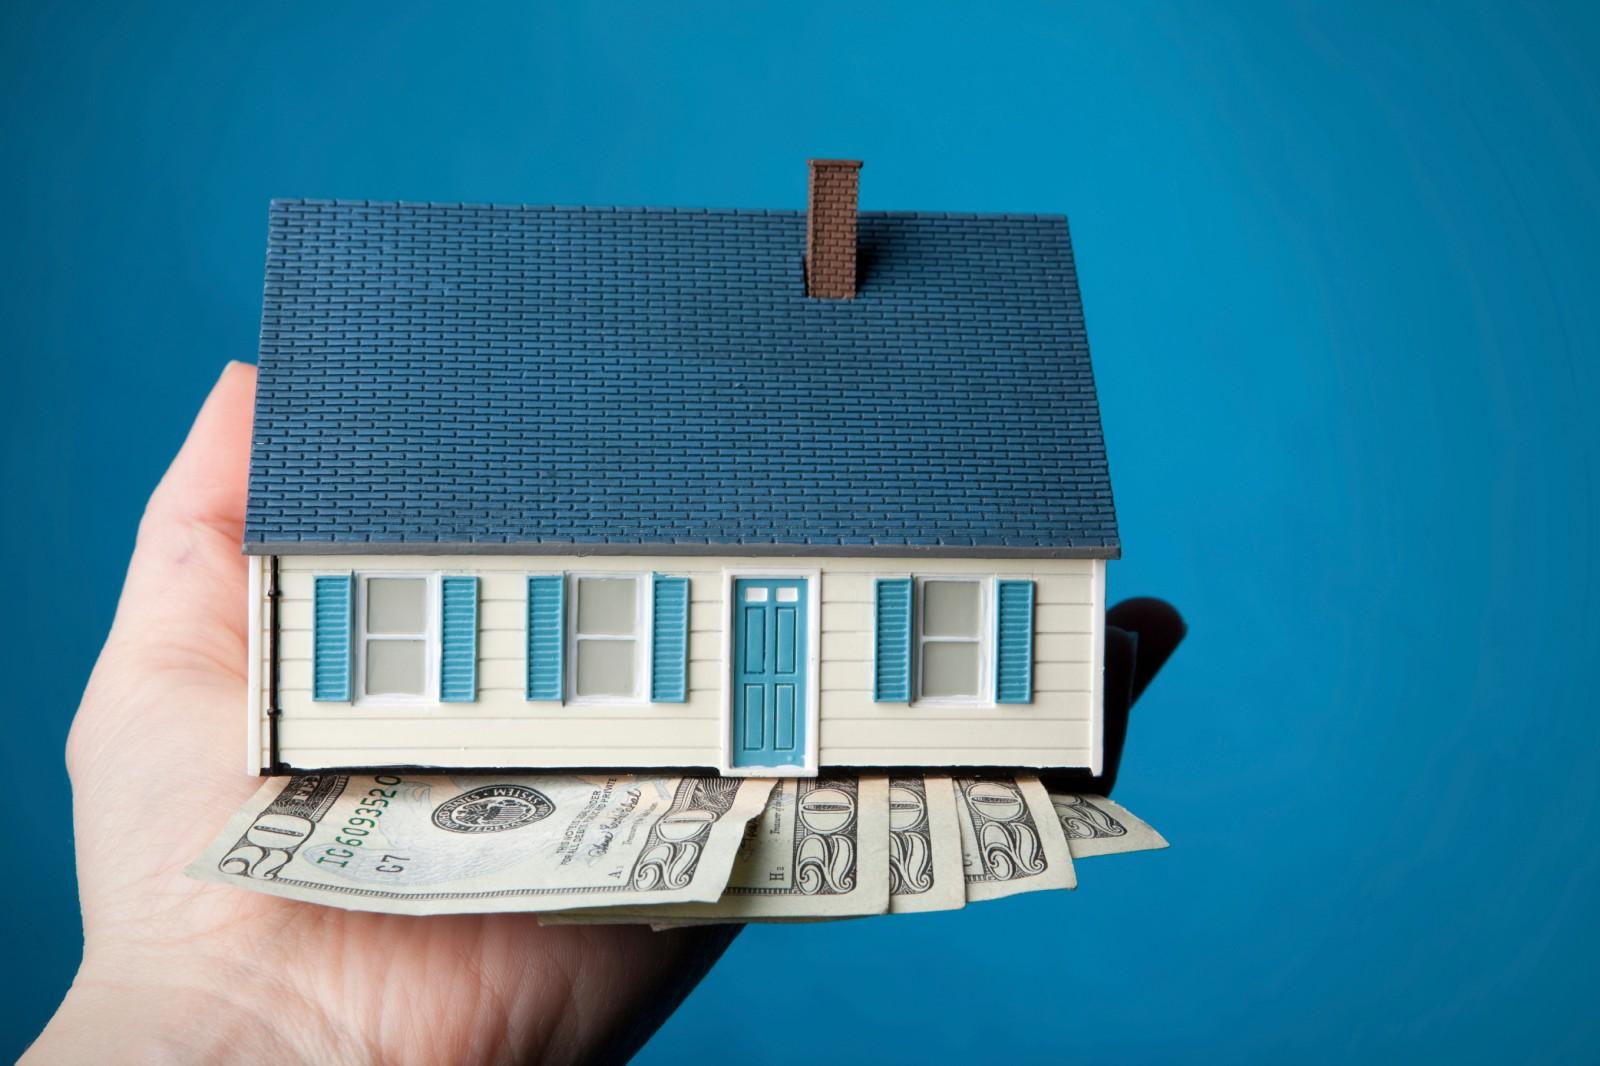 запрет займов под залог недвижимости